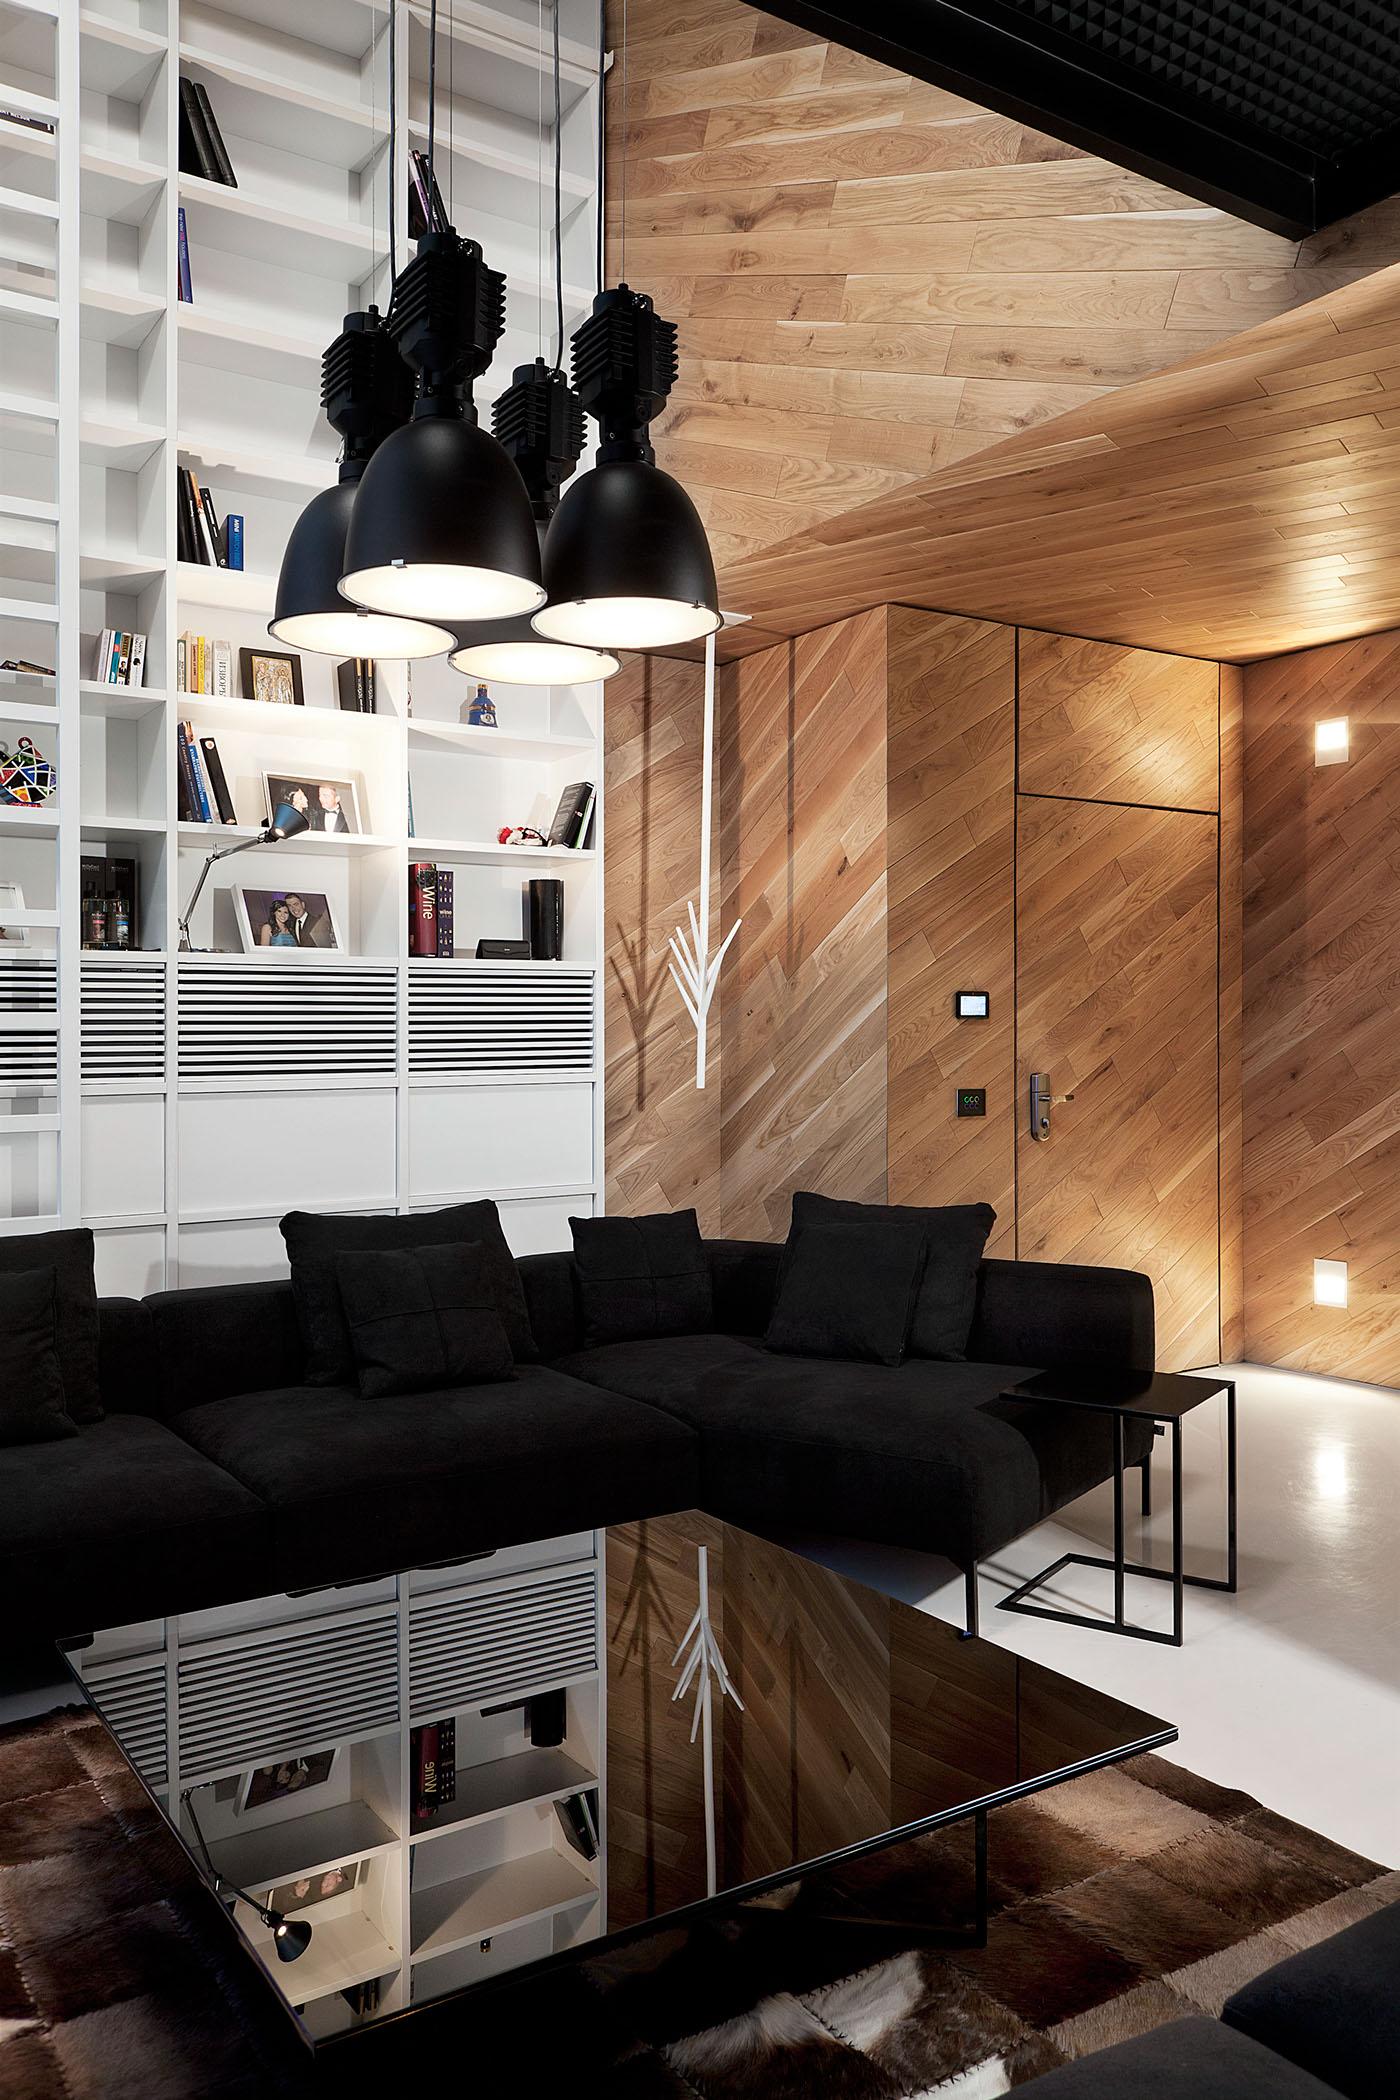 studio mode4 Loft Apartment By Studio Mode